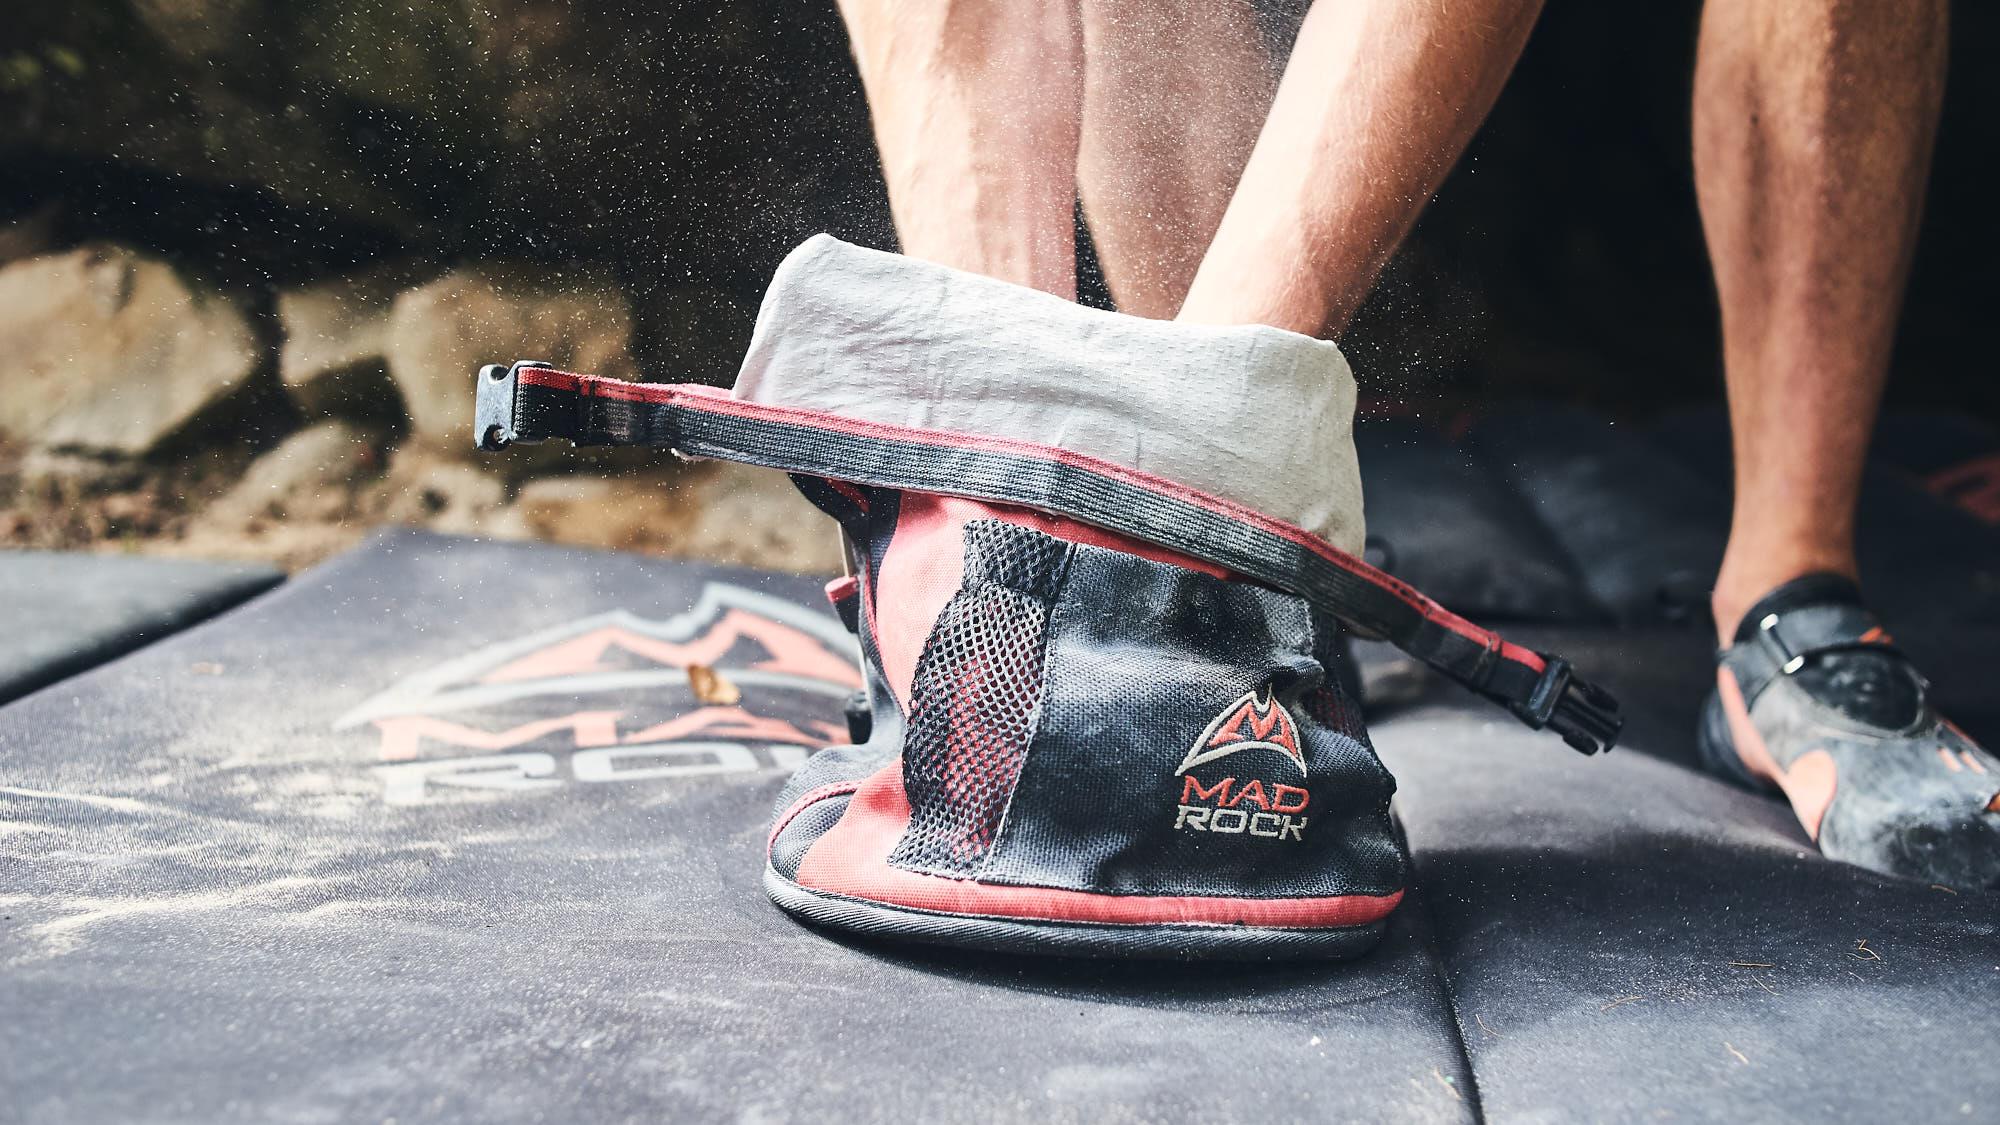 Mad Rock chalk bag on a crashpad